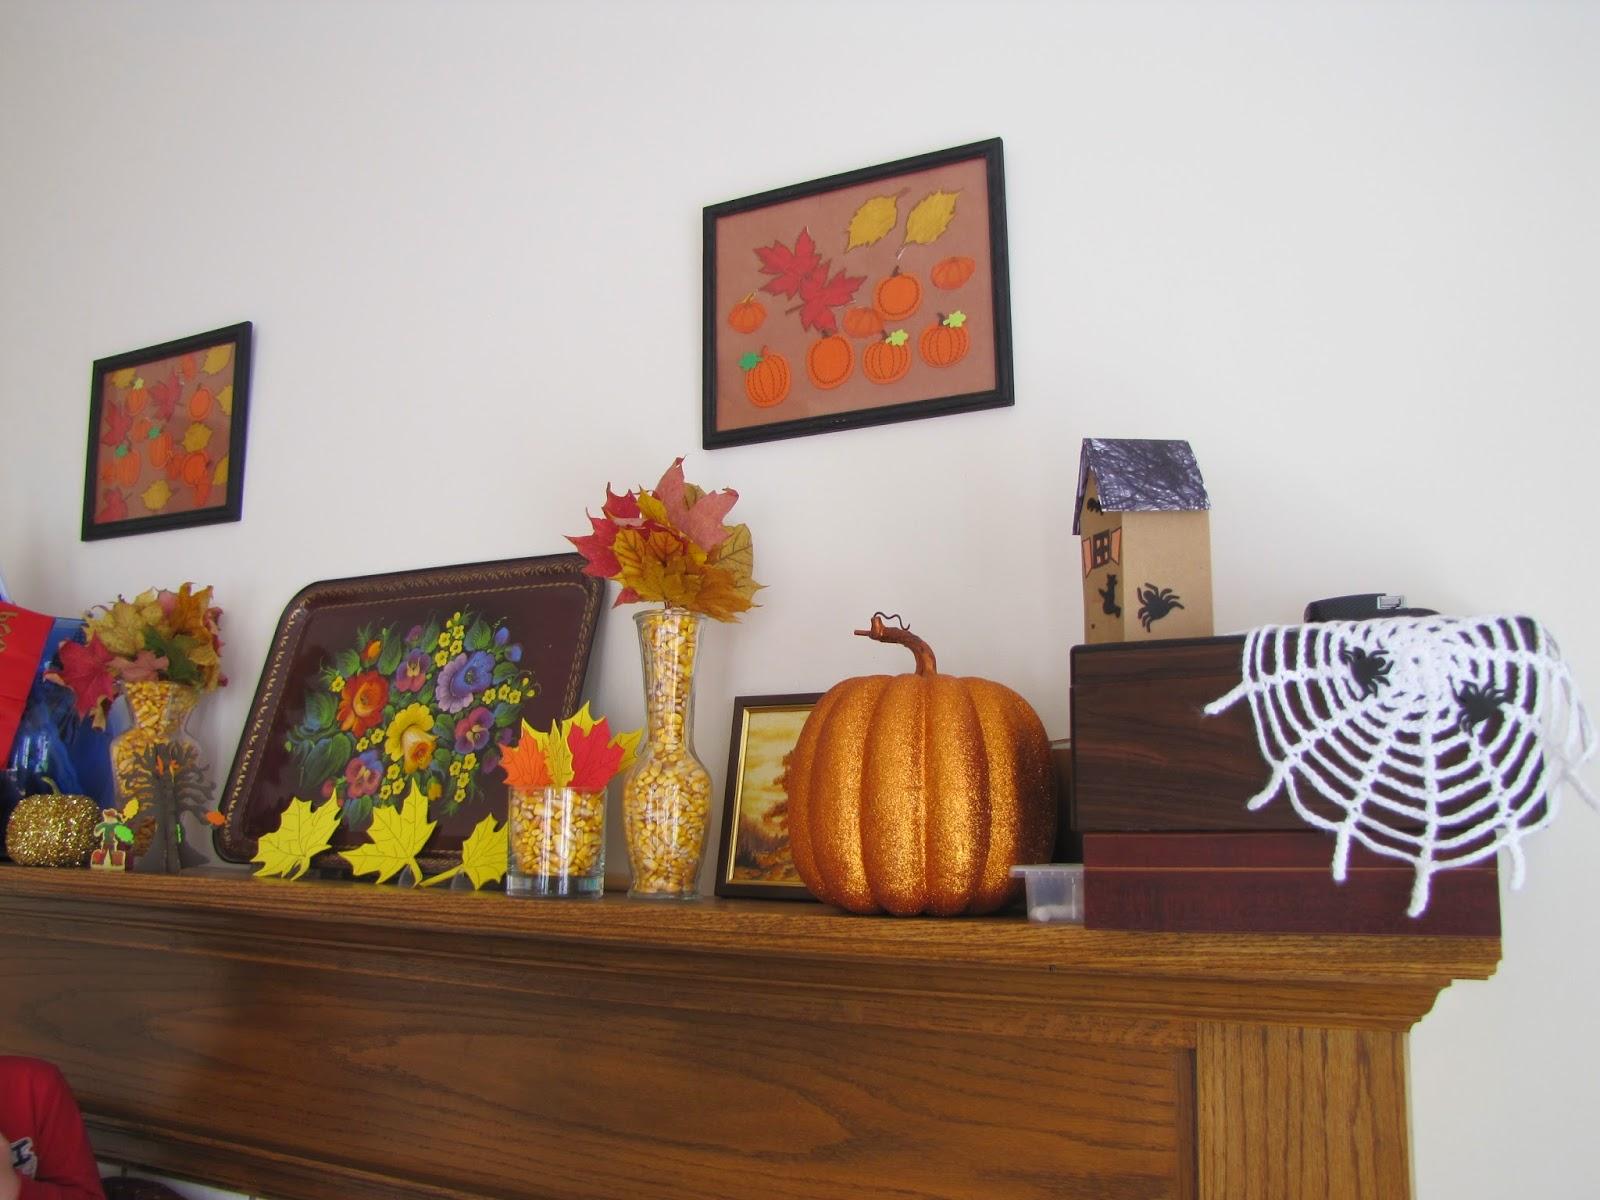 fall, autumn, pumpikn, corn, leaves